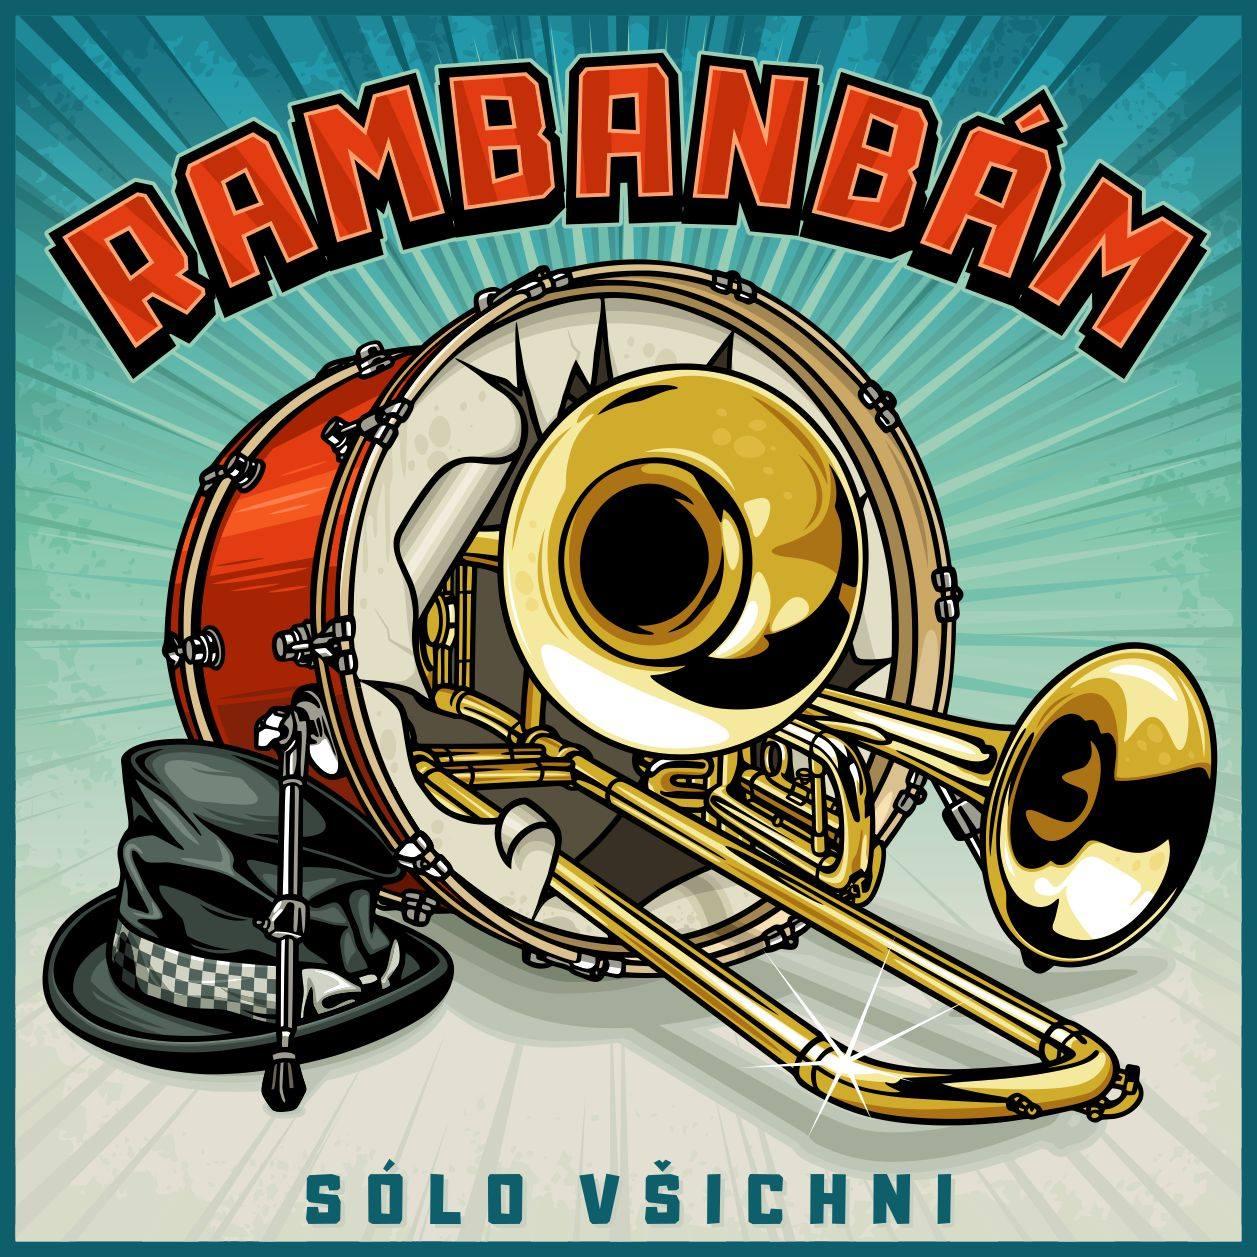 RAMBANBAM_Solo_vsichni_front